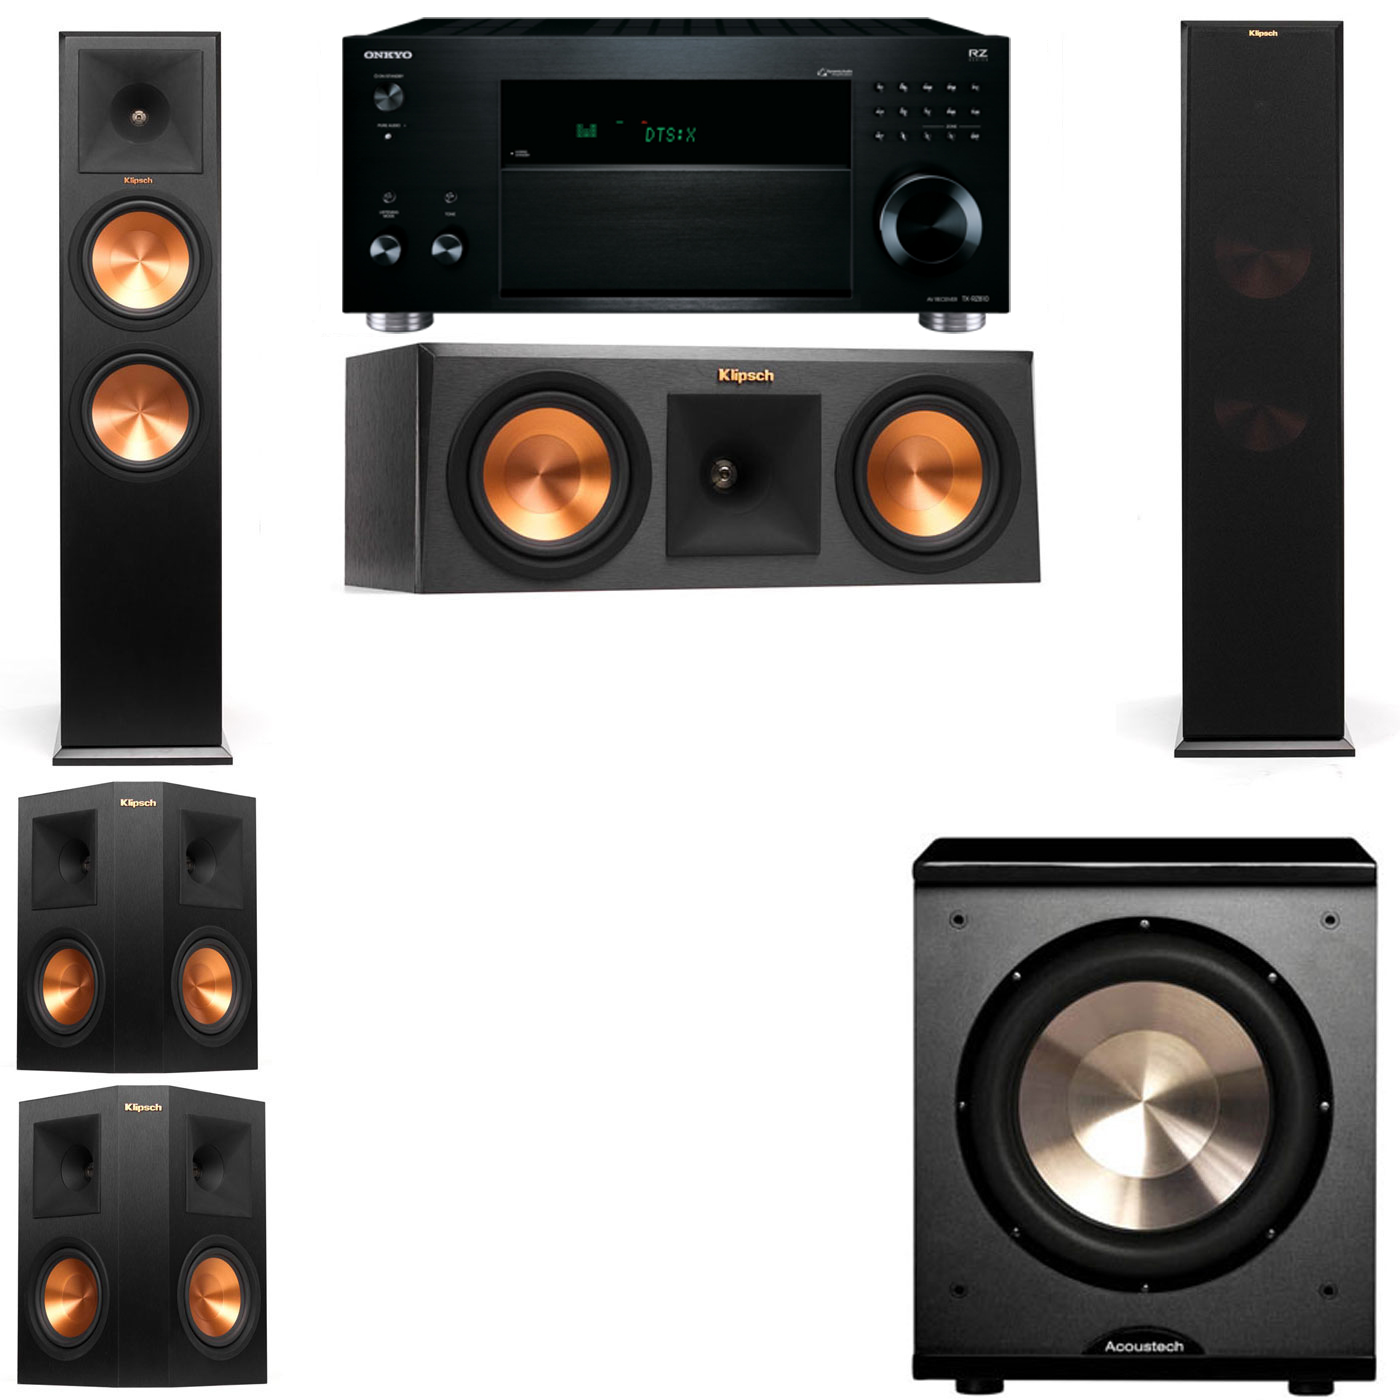 Klipsch RP-280F Tower Speakers-RP-250C-PL-200-5.1-Onkyo TX-RZ810